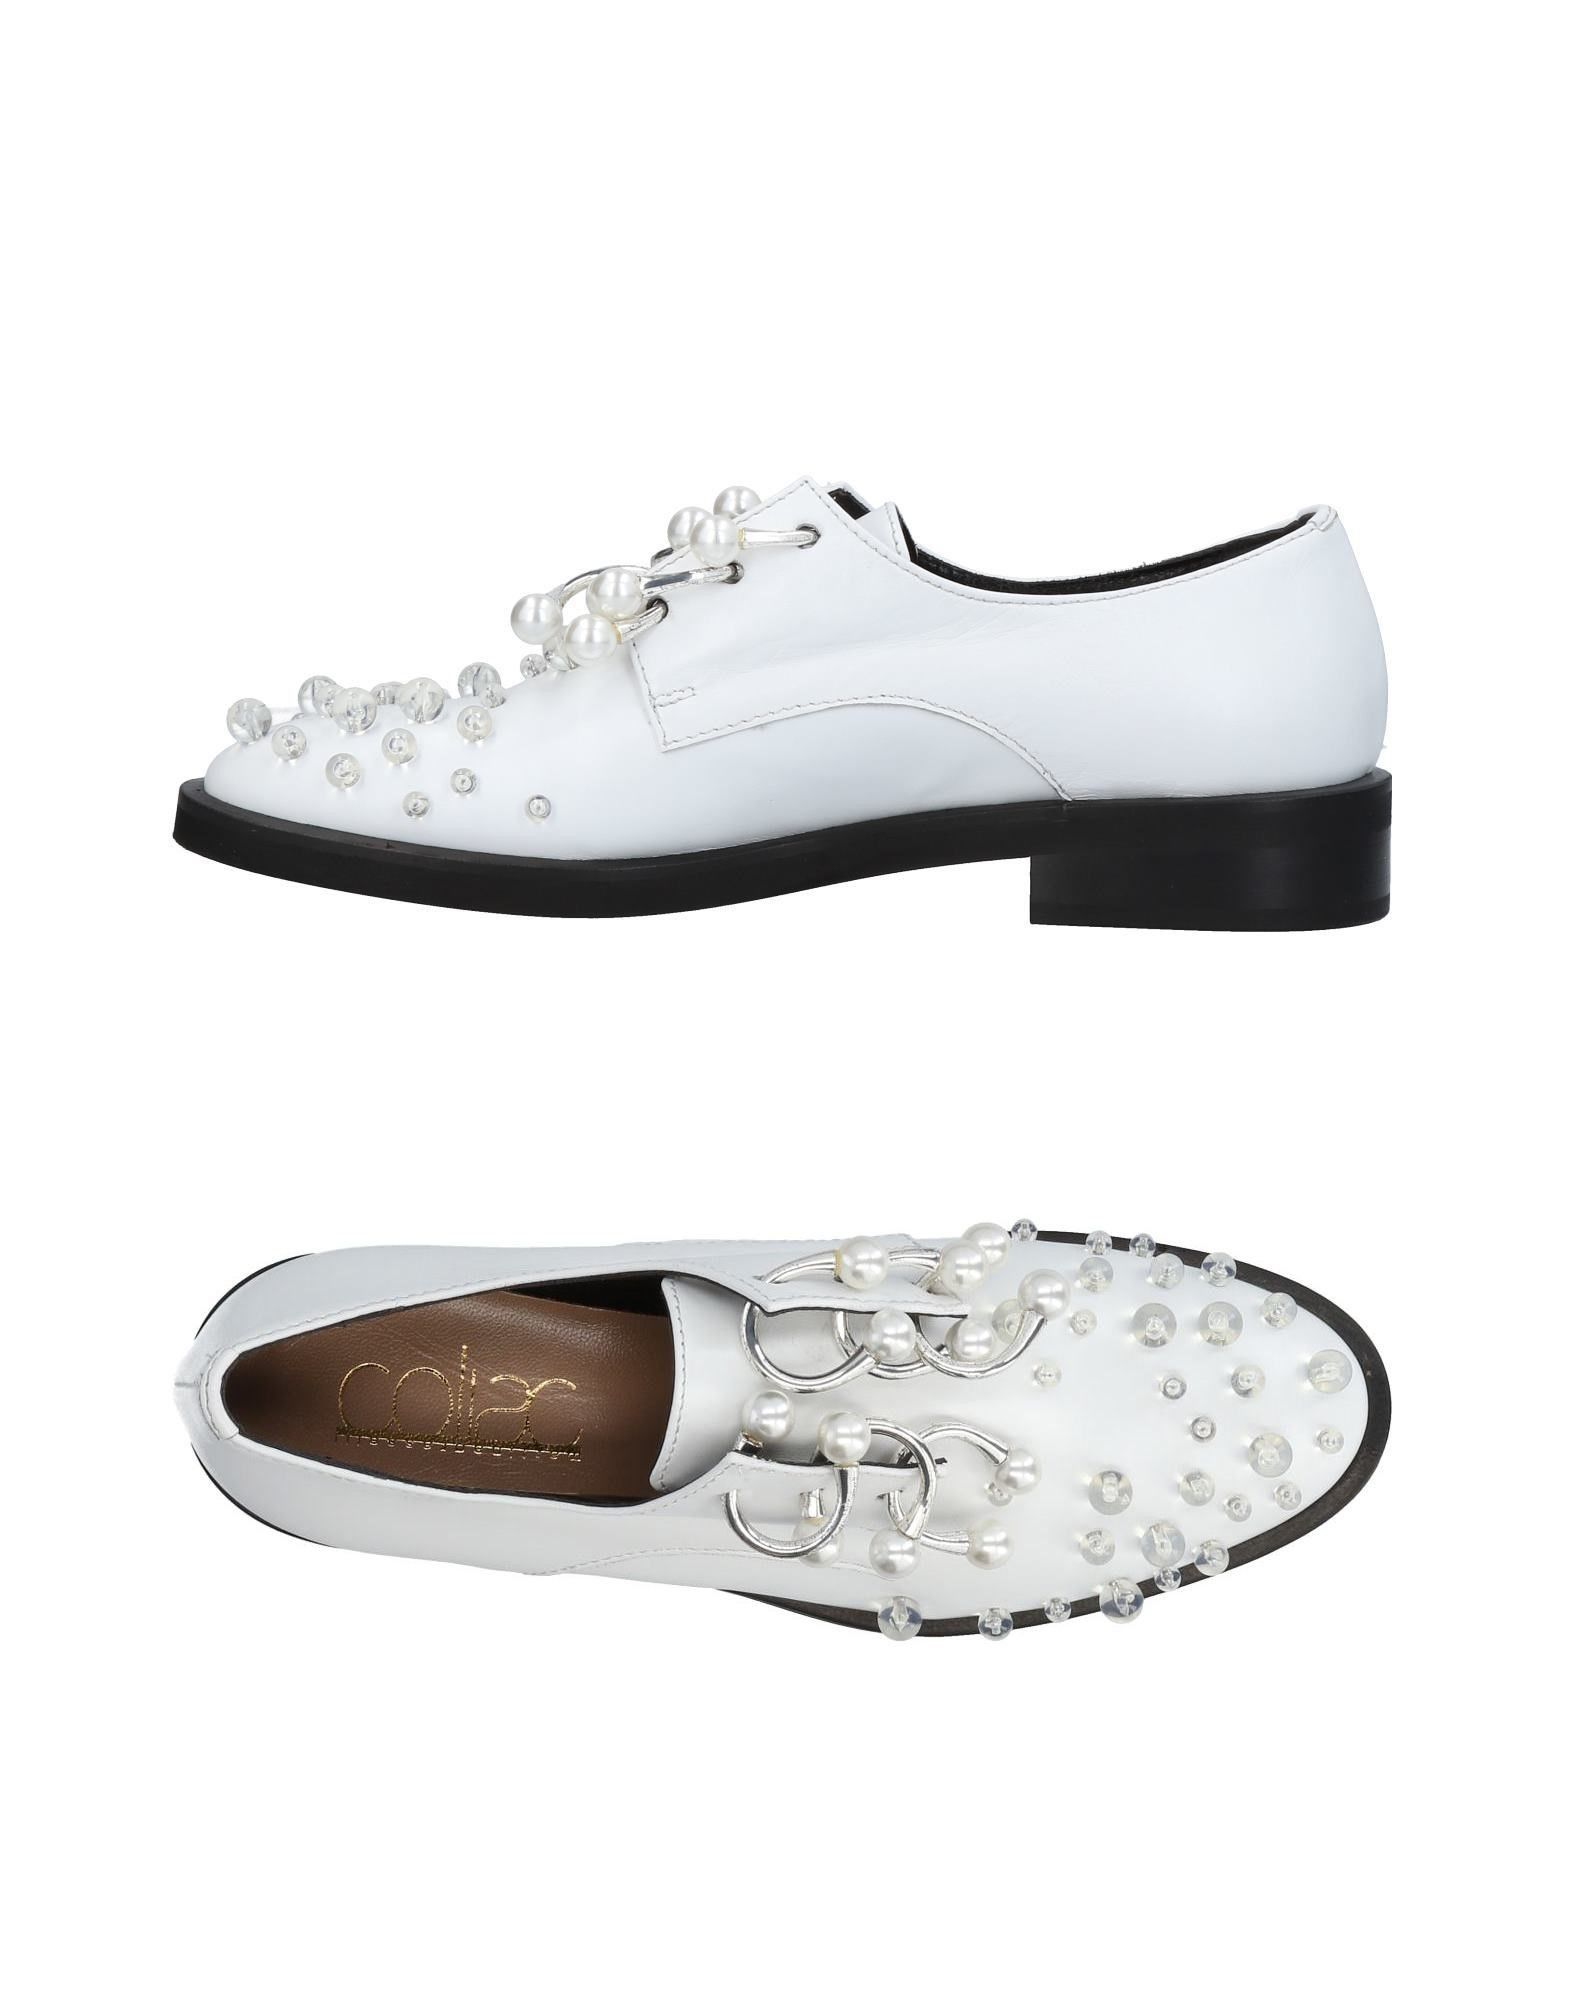 Coliac Martina Grasselli Mokassins Damen  11426180NLGut aussehende strapazierfähige Schuhe